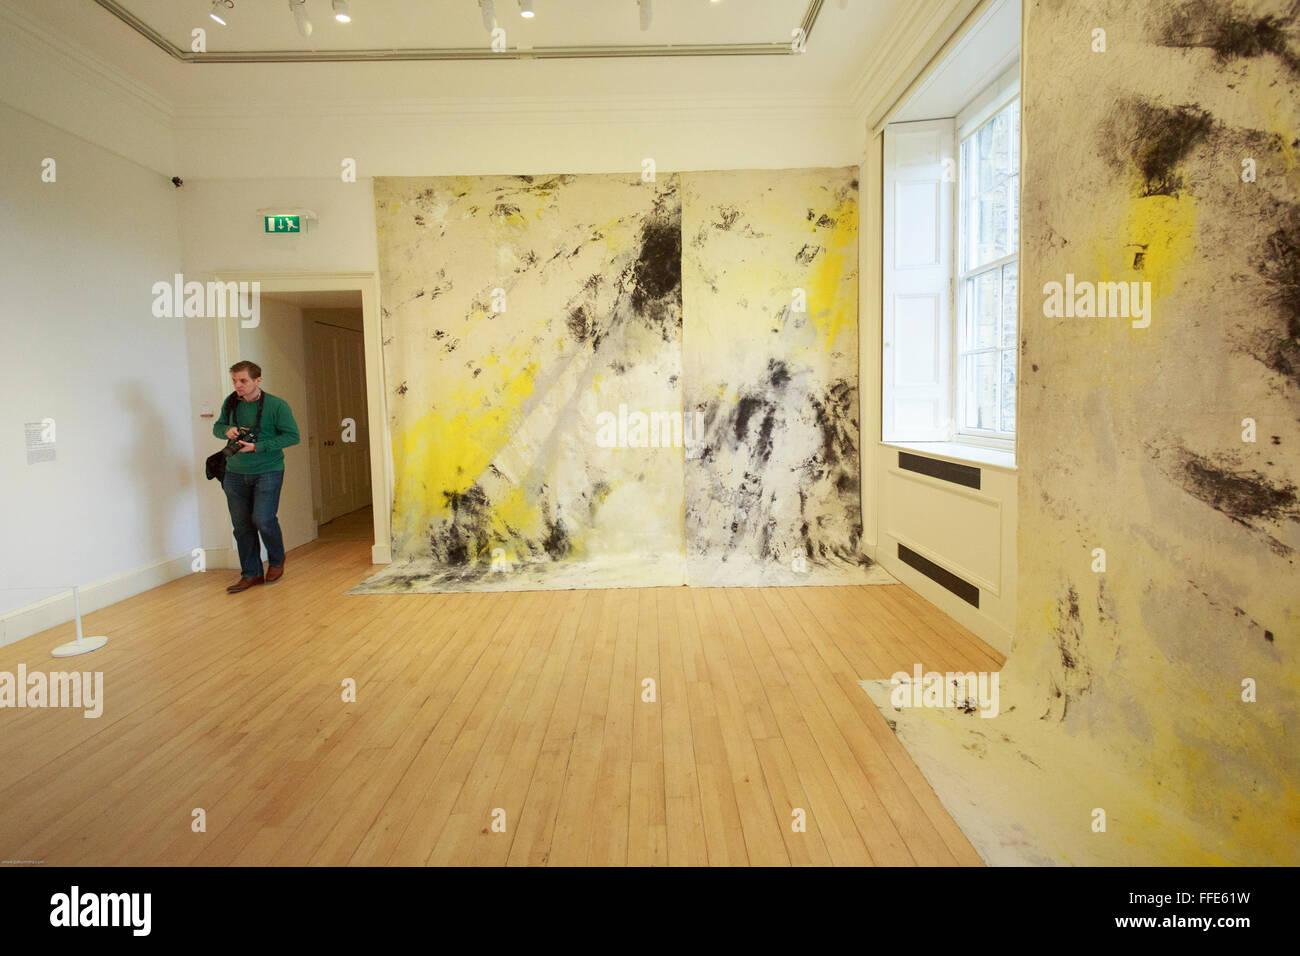 Scottish National Gallery Of Modern Art One Stock Photos & Scottish ...